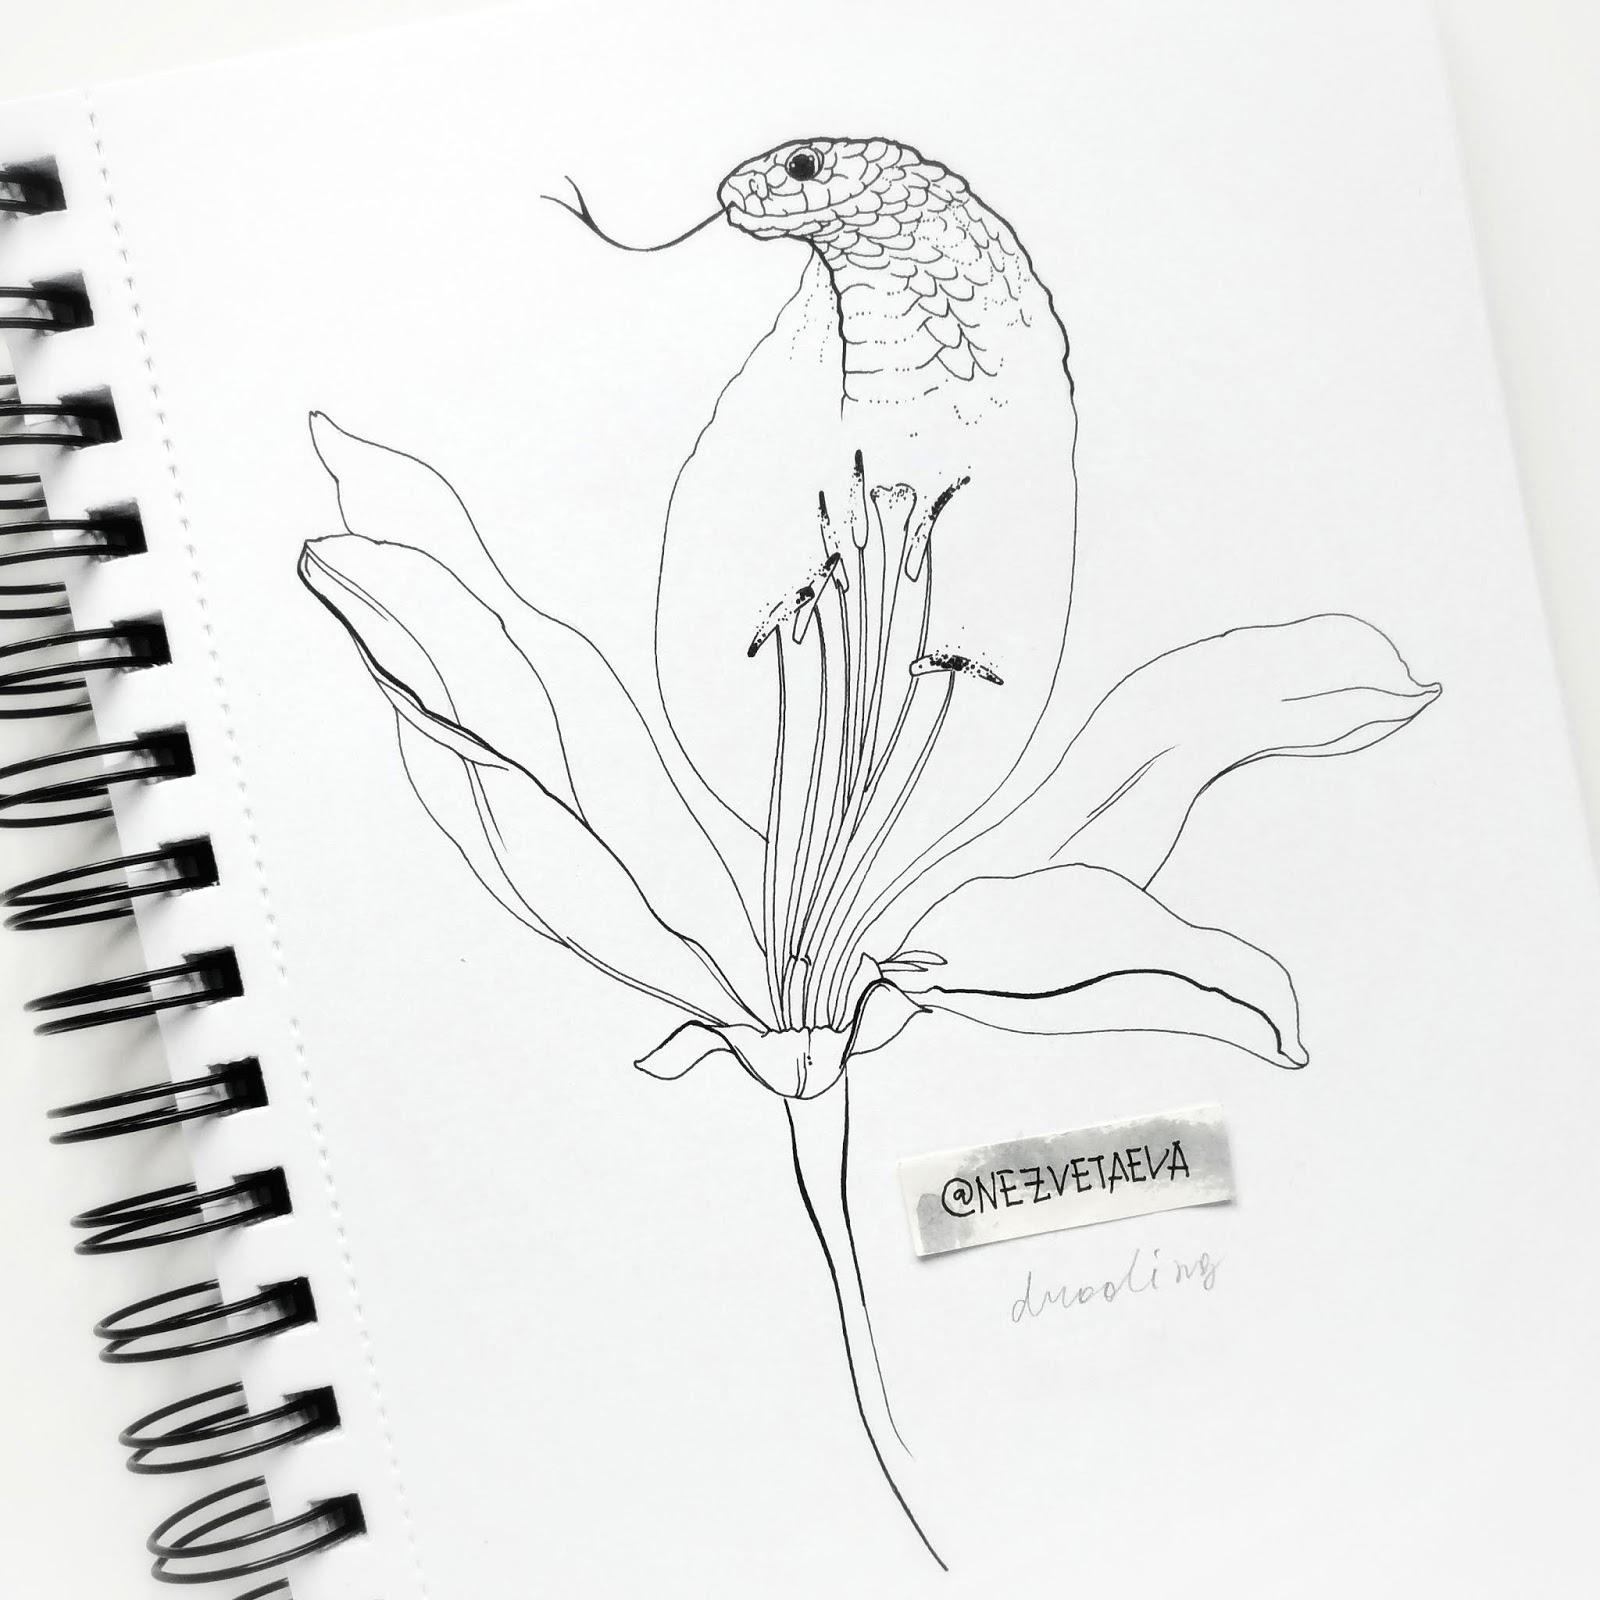 sonia-nezvetaeva-inktober2018-lily-dotwork-sketch